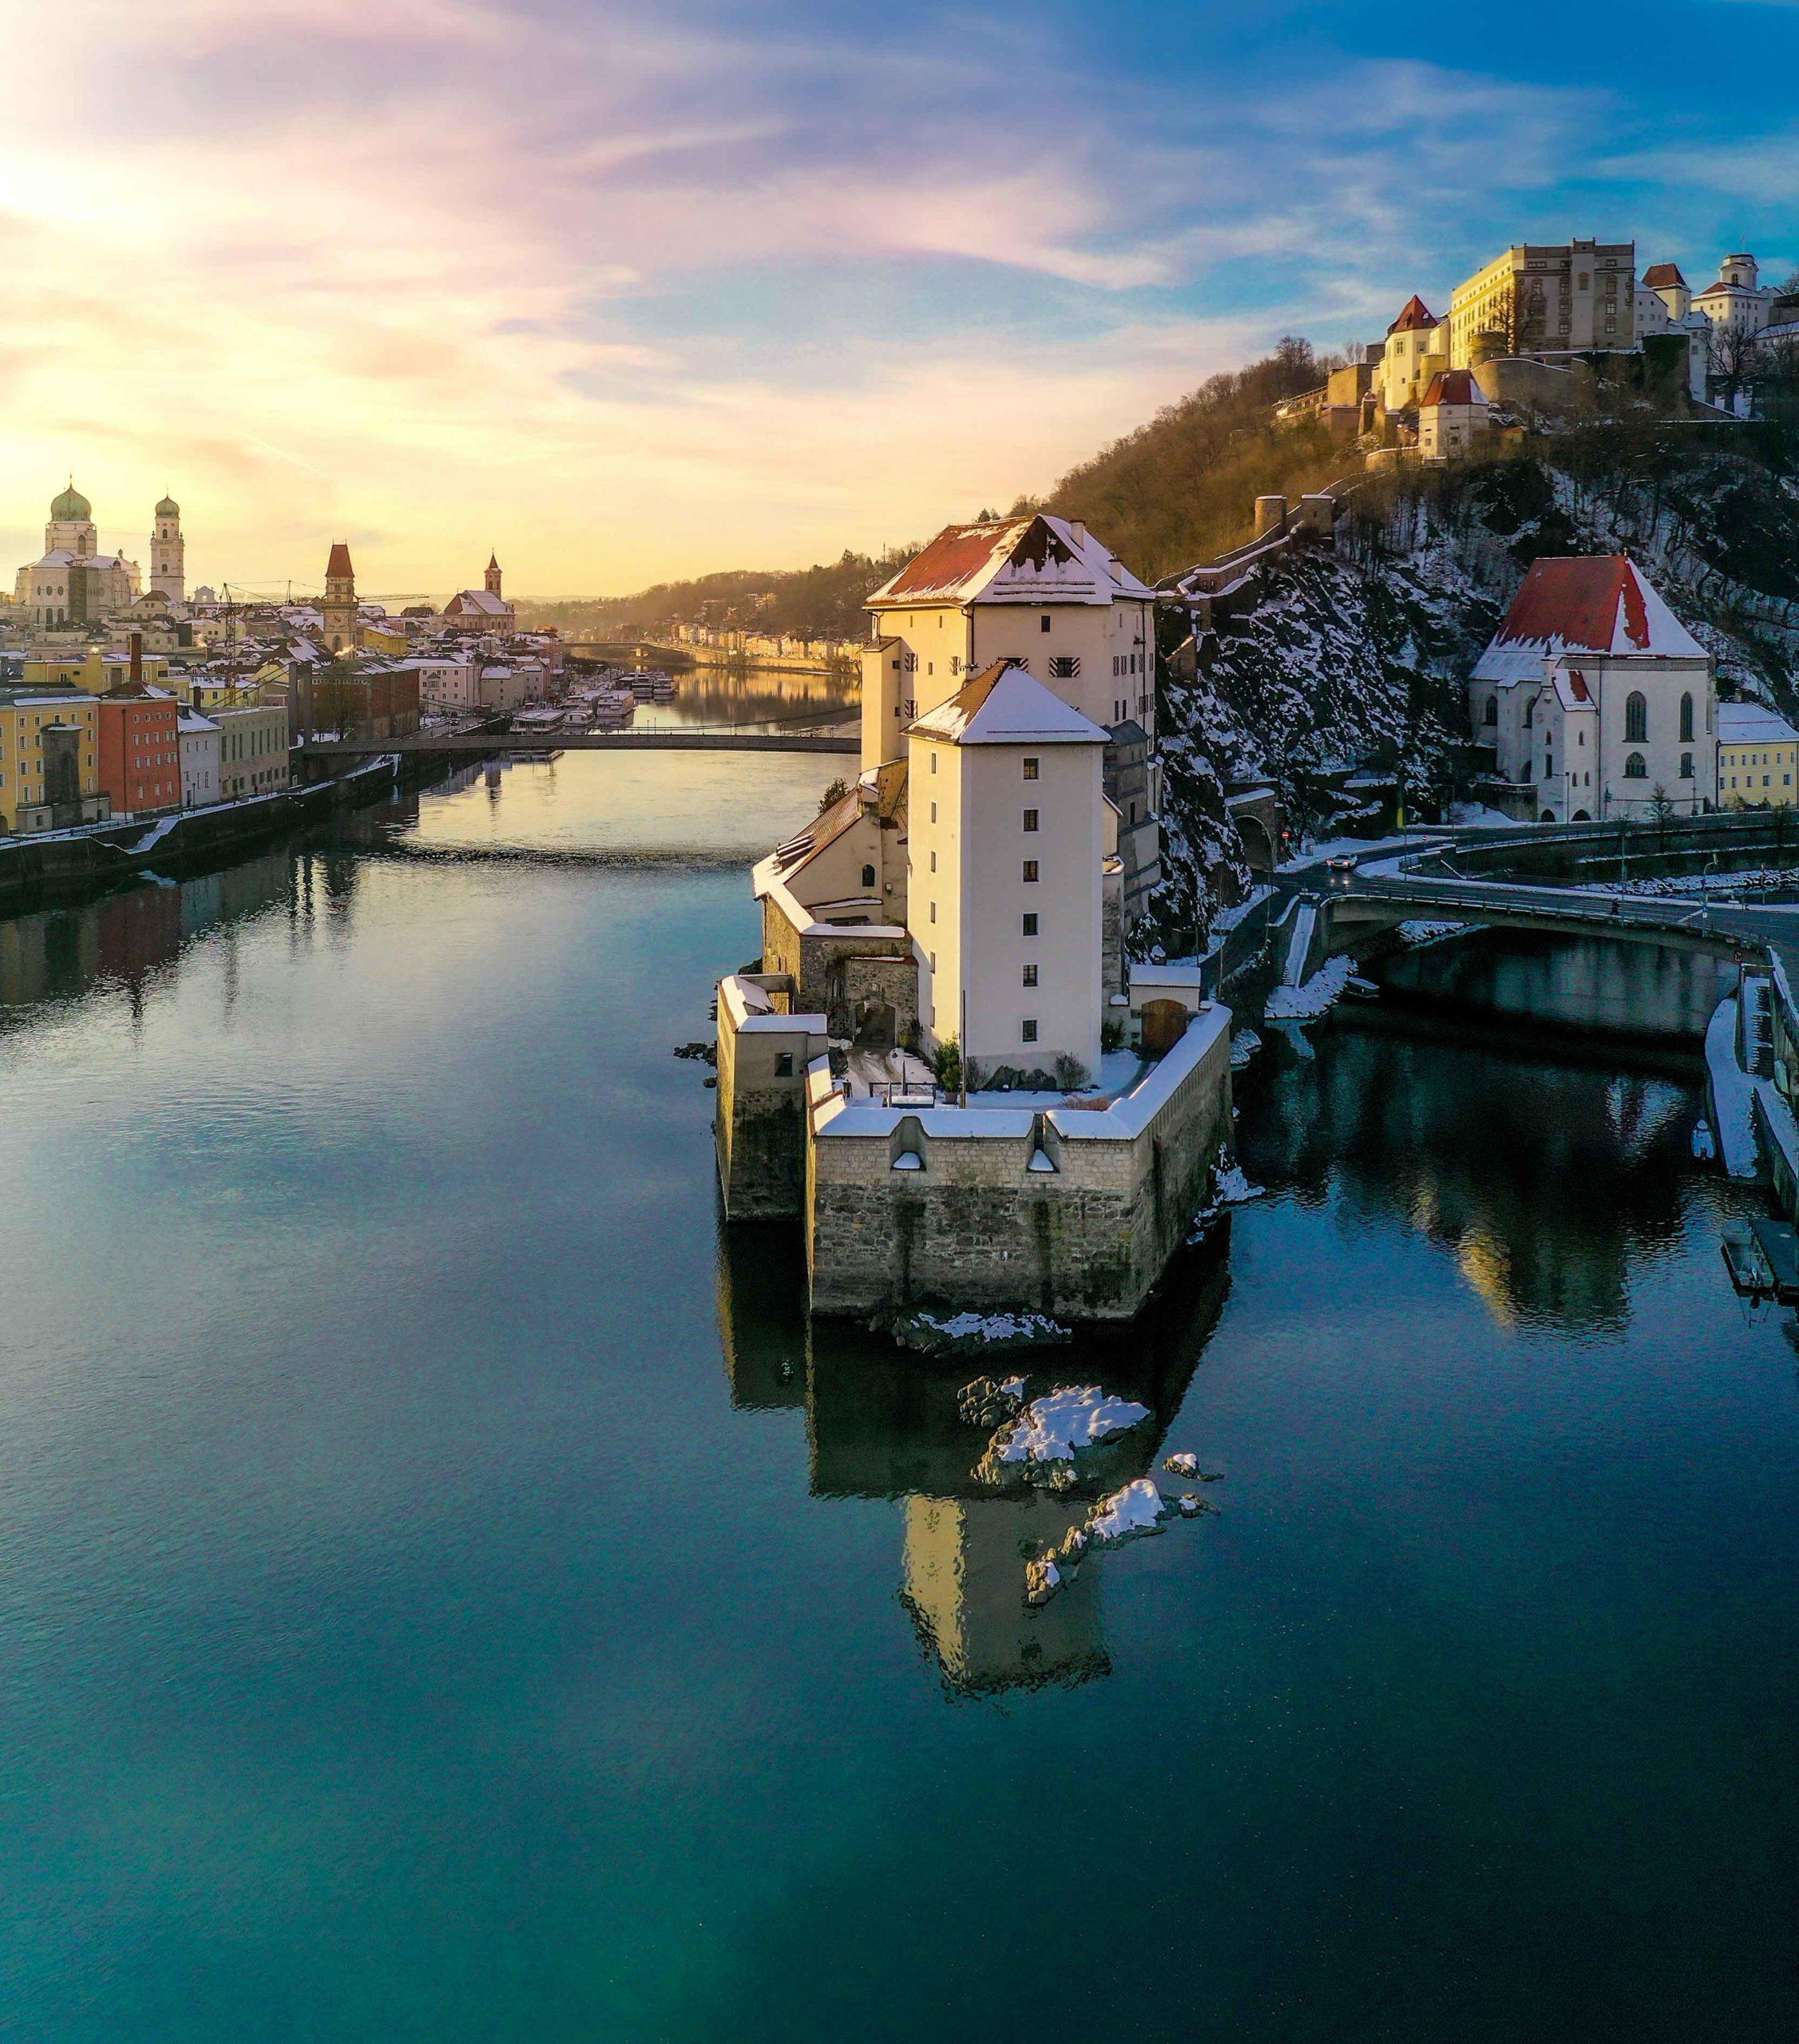 Niederhaus Passau Luftbildaufnahme